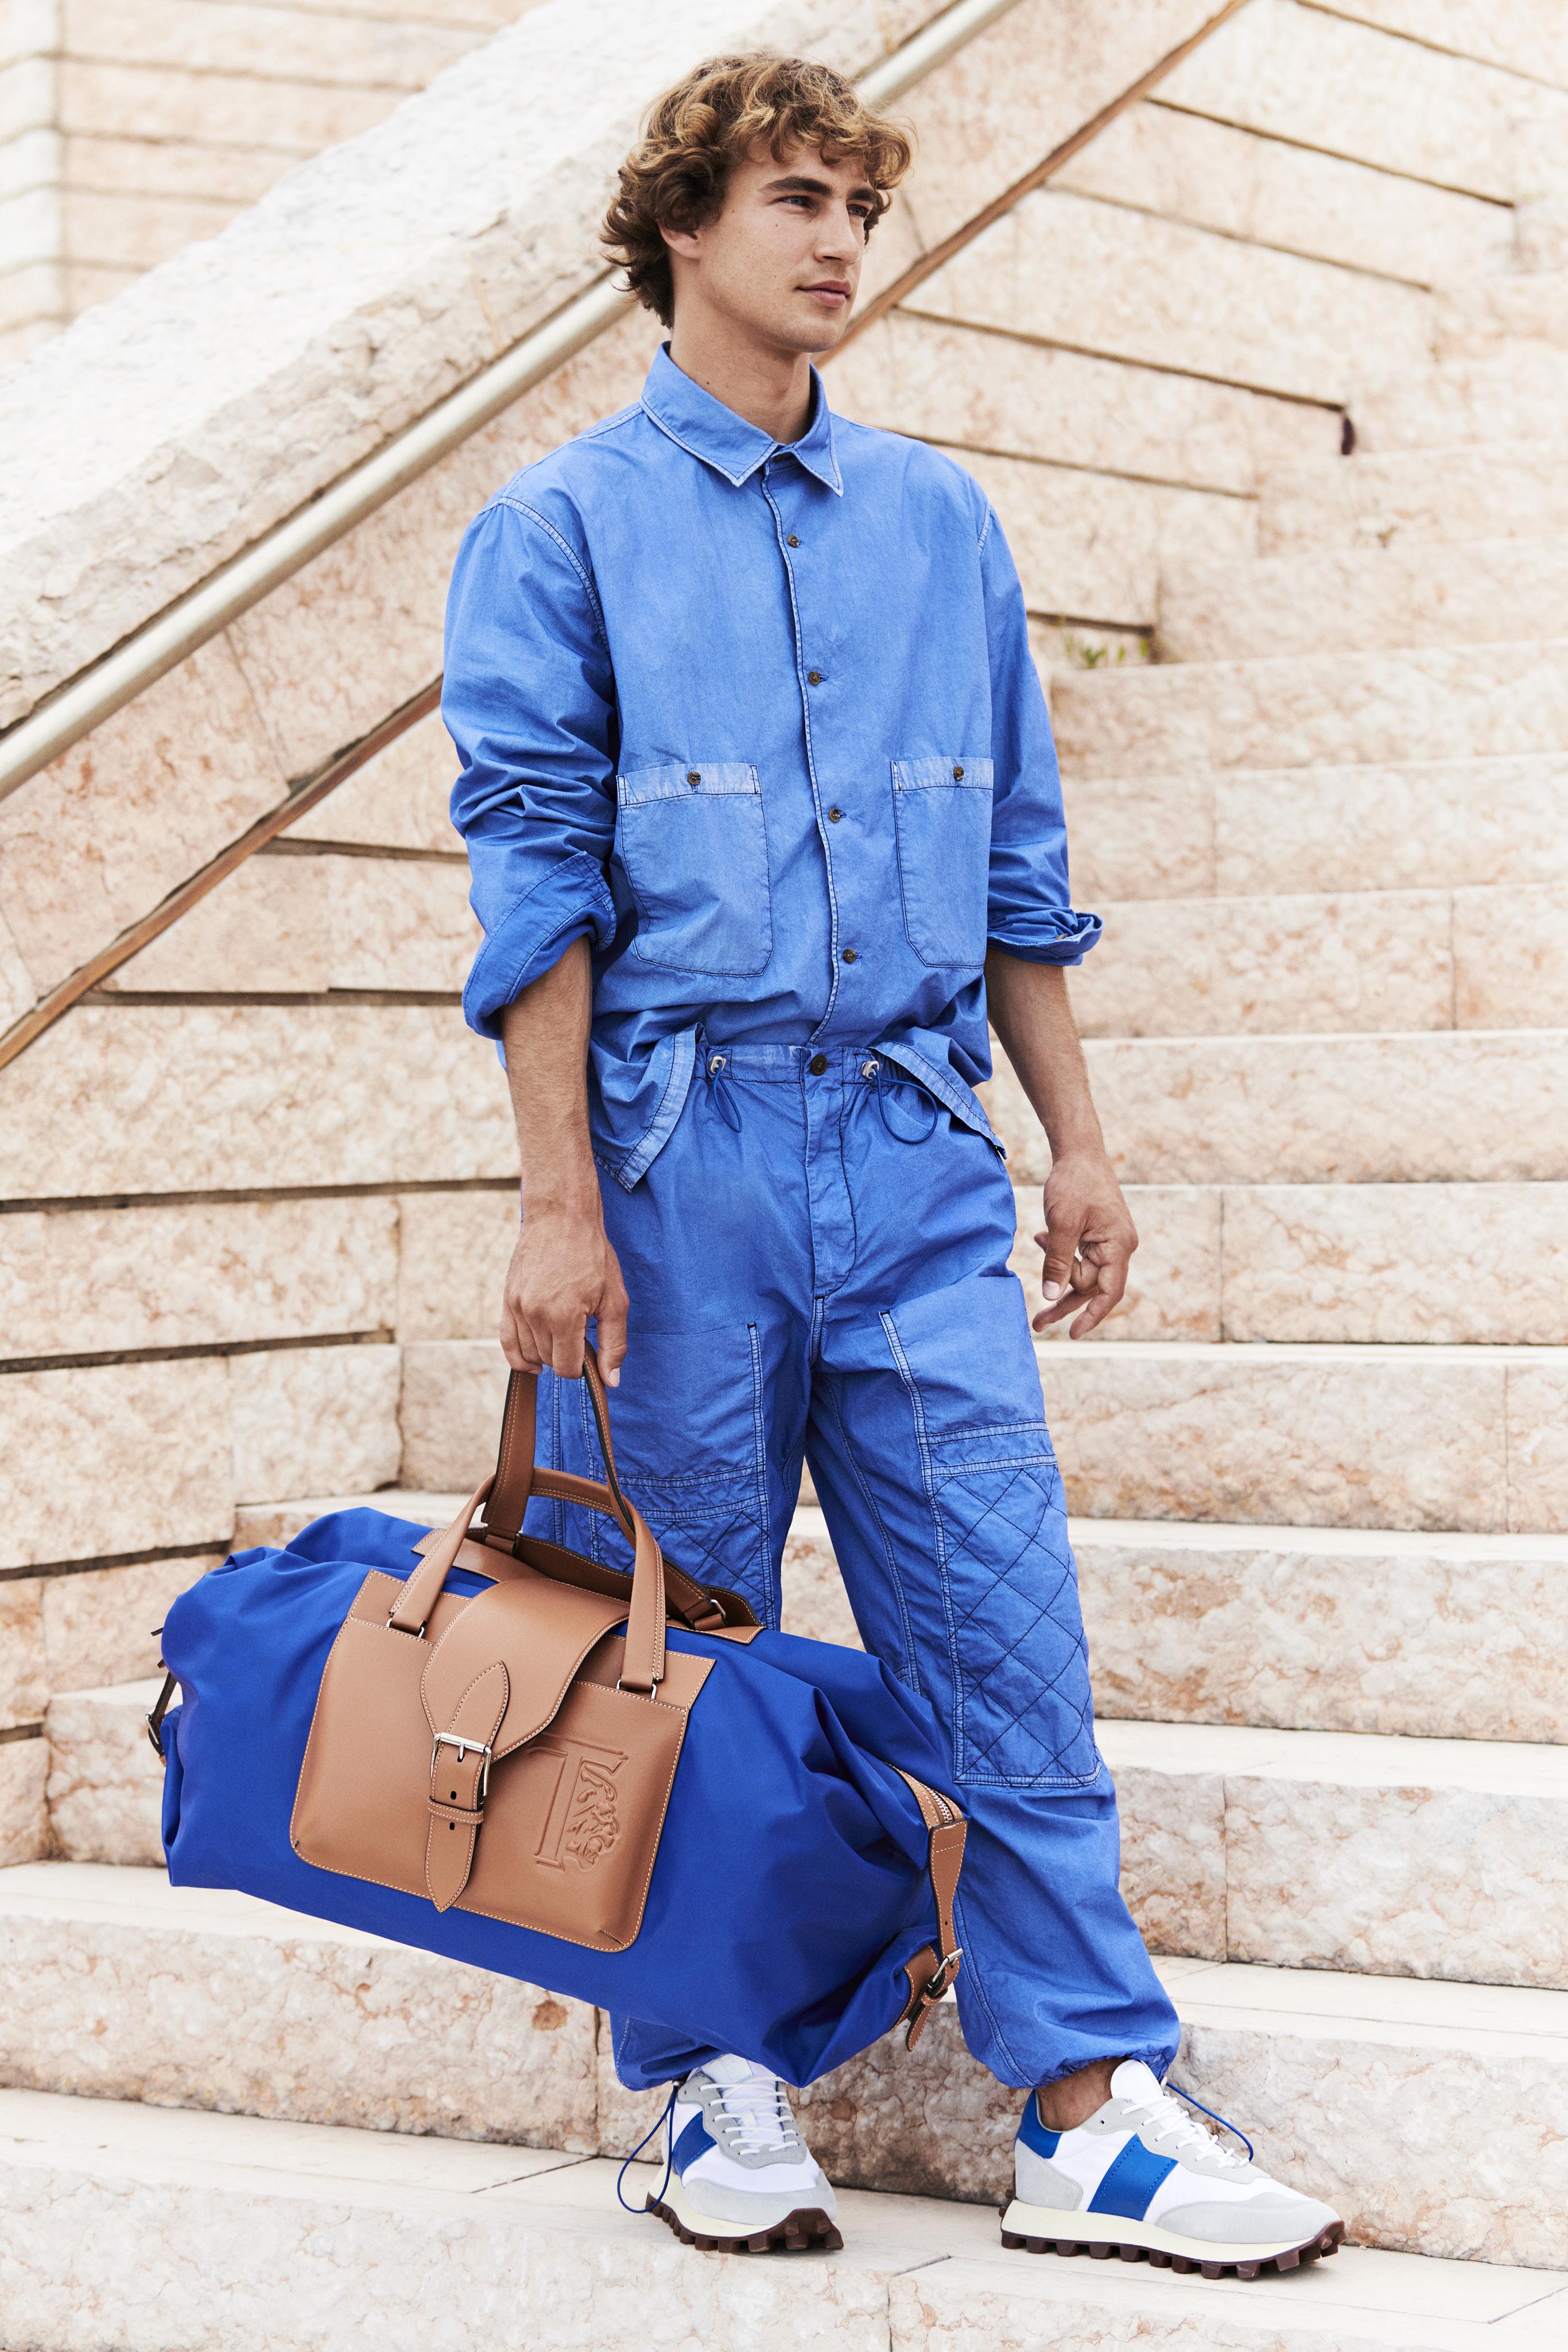 men's fashion week